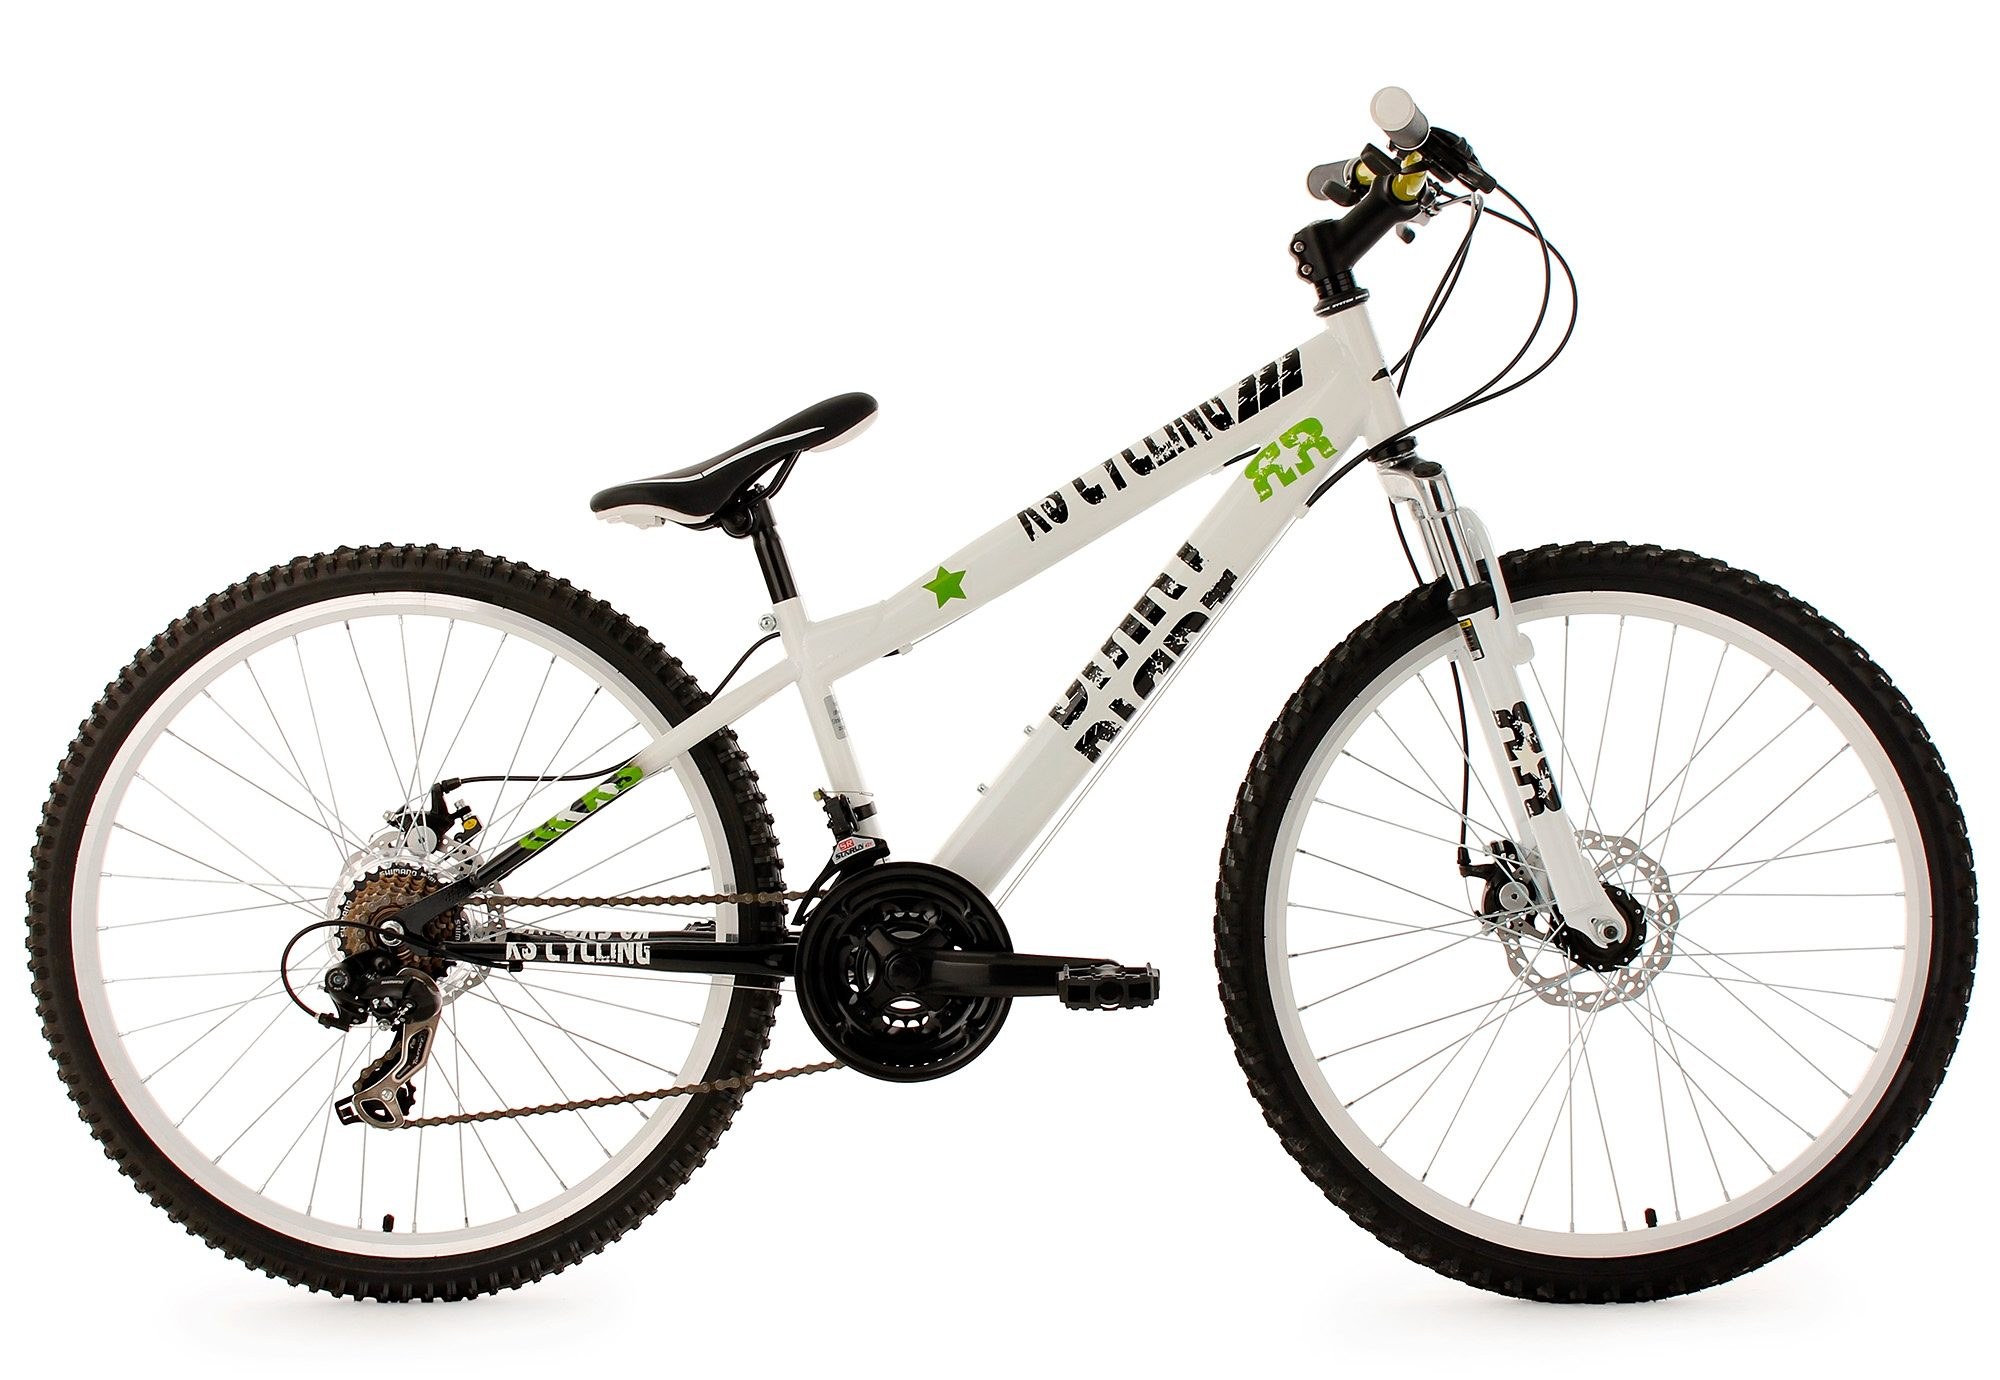 MTB Dirtbike, KS Cycling, »DIRRT«, Hardtail, 26 Zoll, 21 Gang Shimano Tourney, mech. Scheibenbremsen